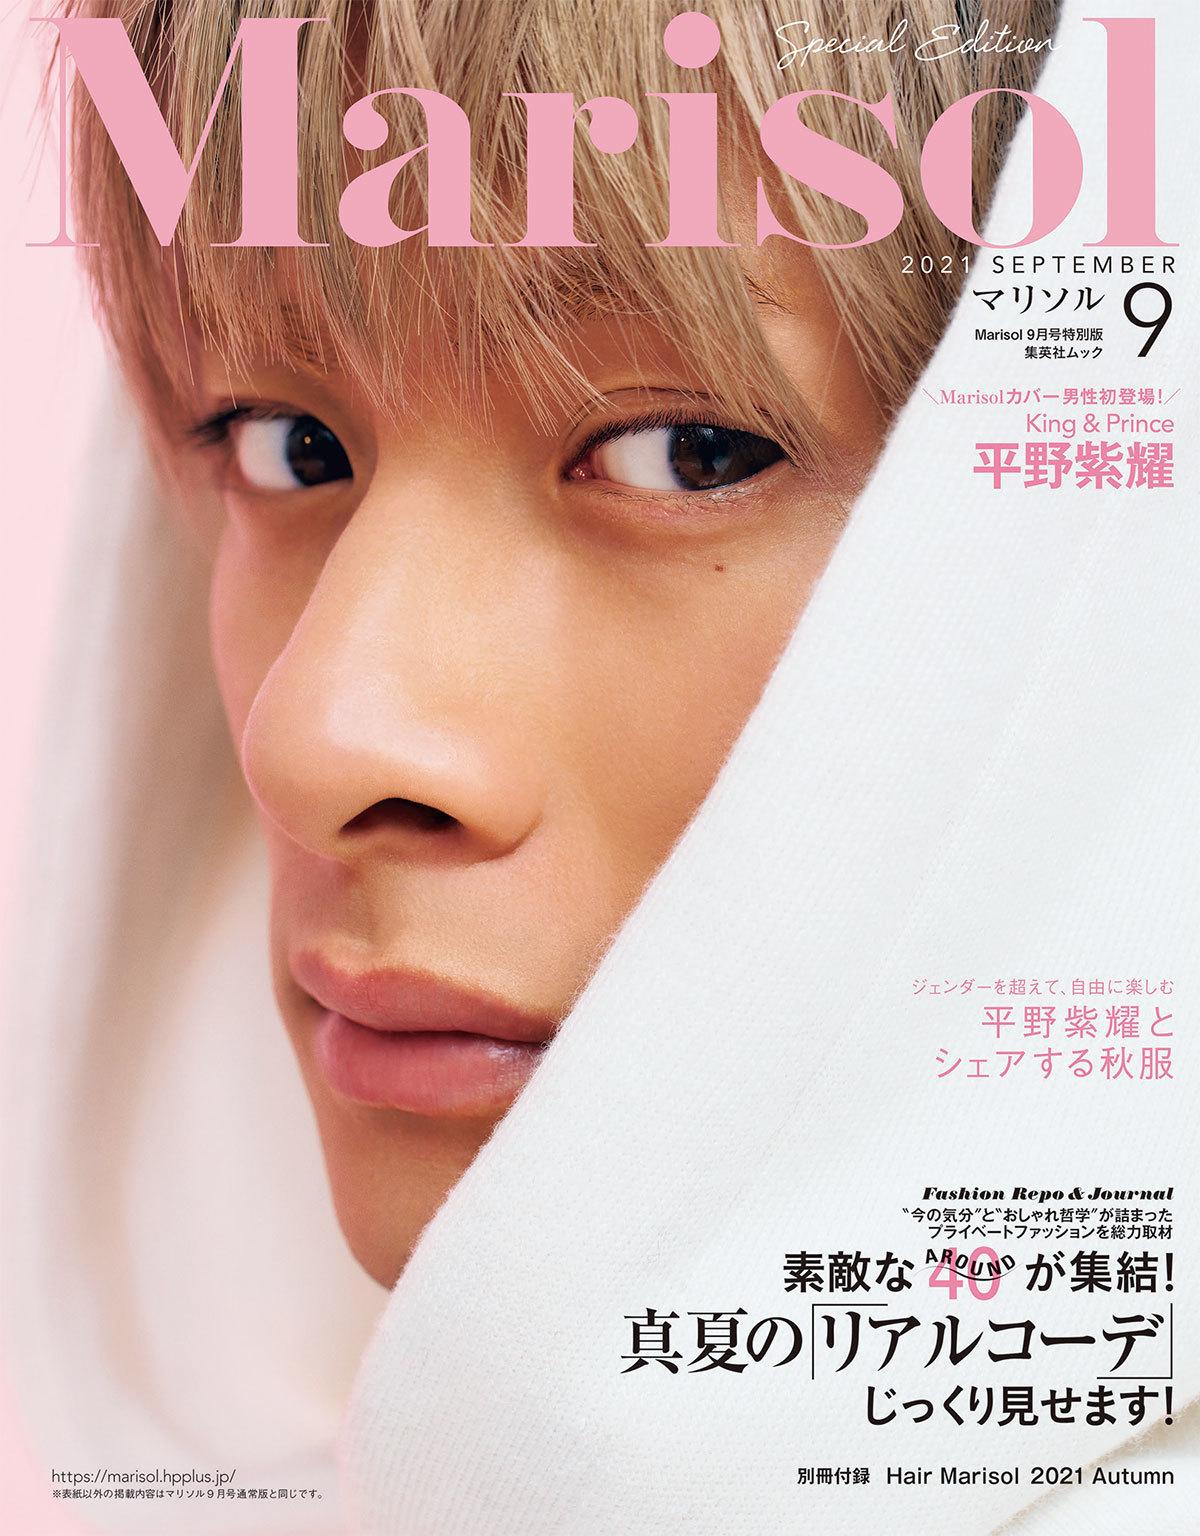 Marisol9月号の特別版・表紙にはKing&Prince平野紫耀さんが登場!